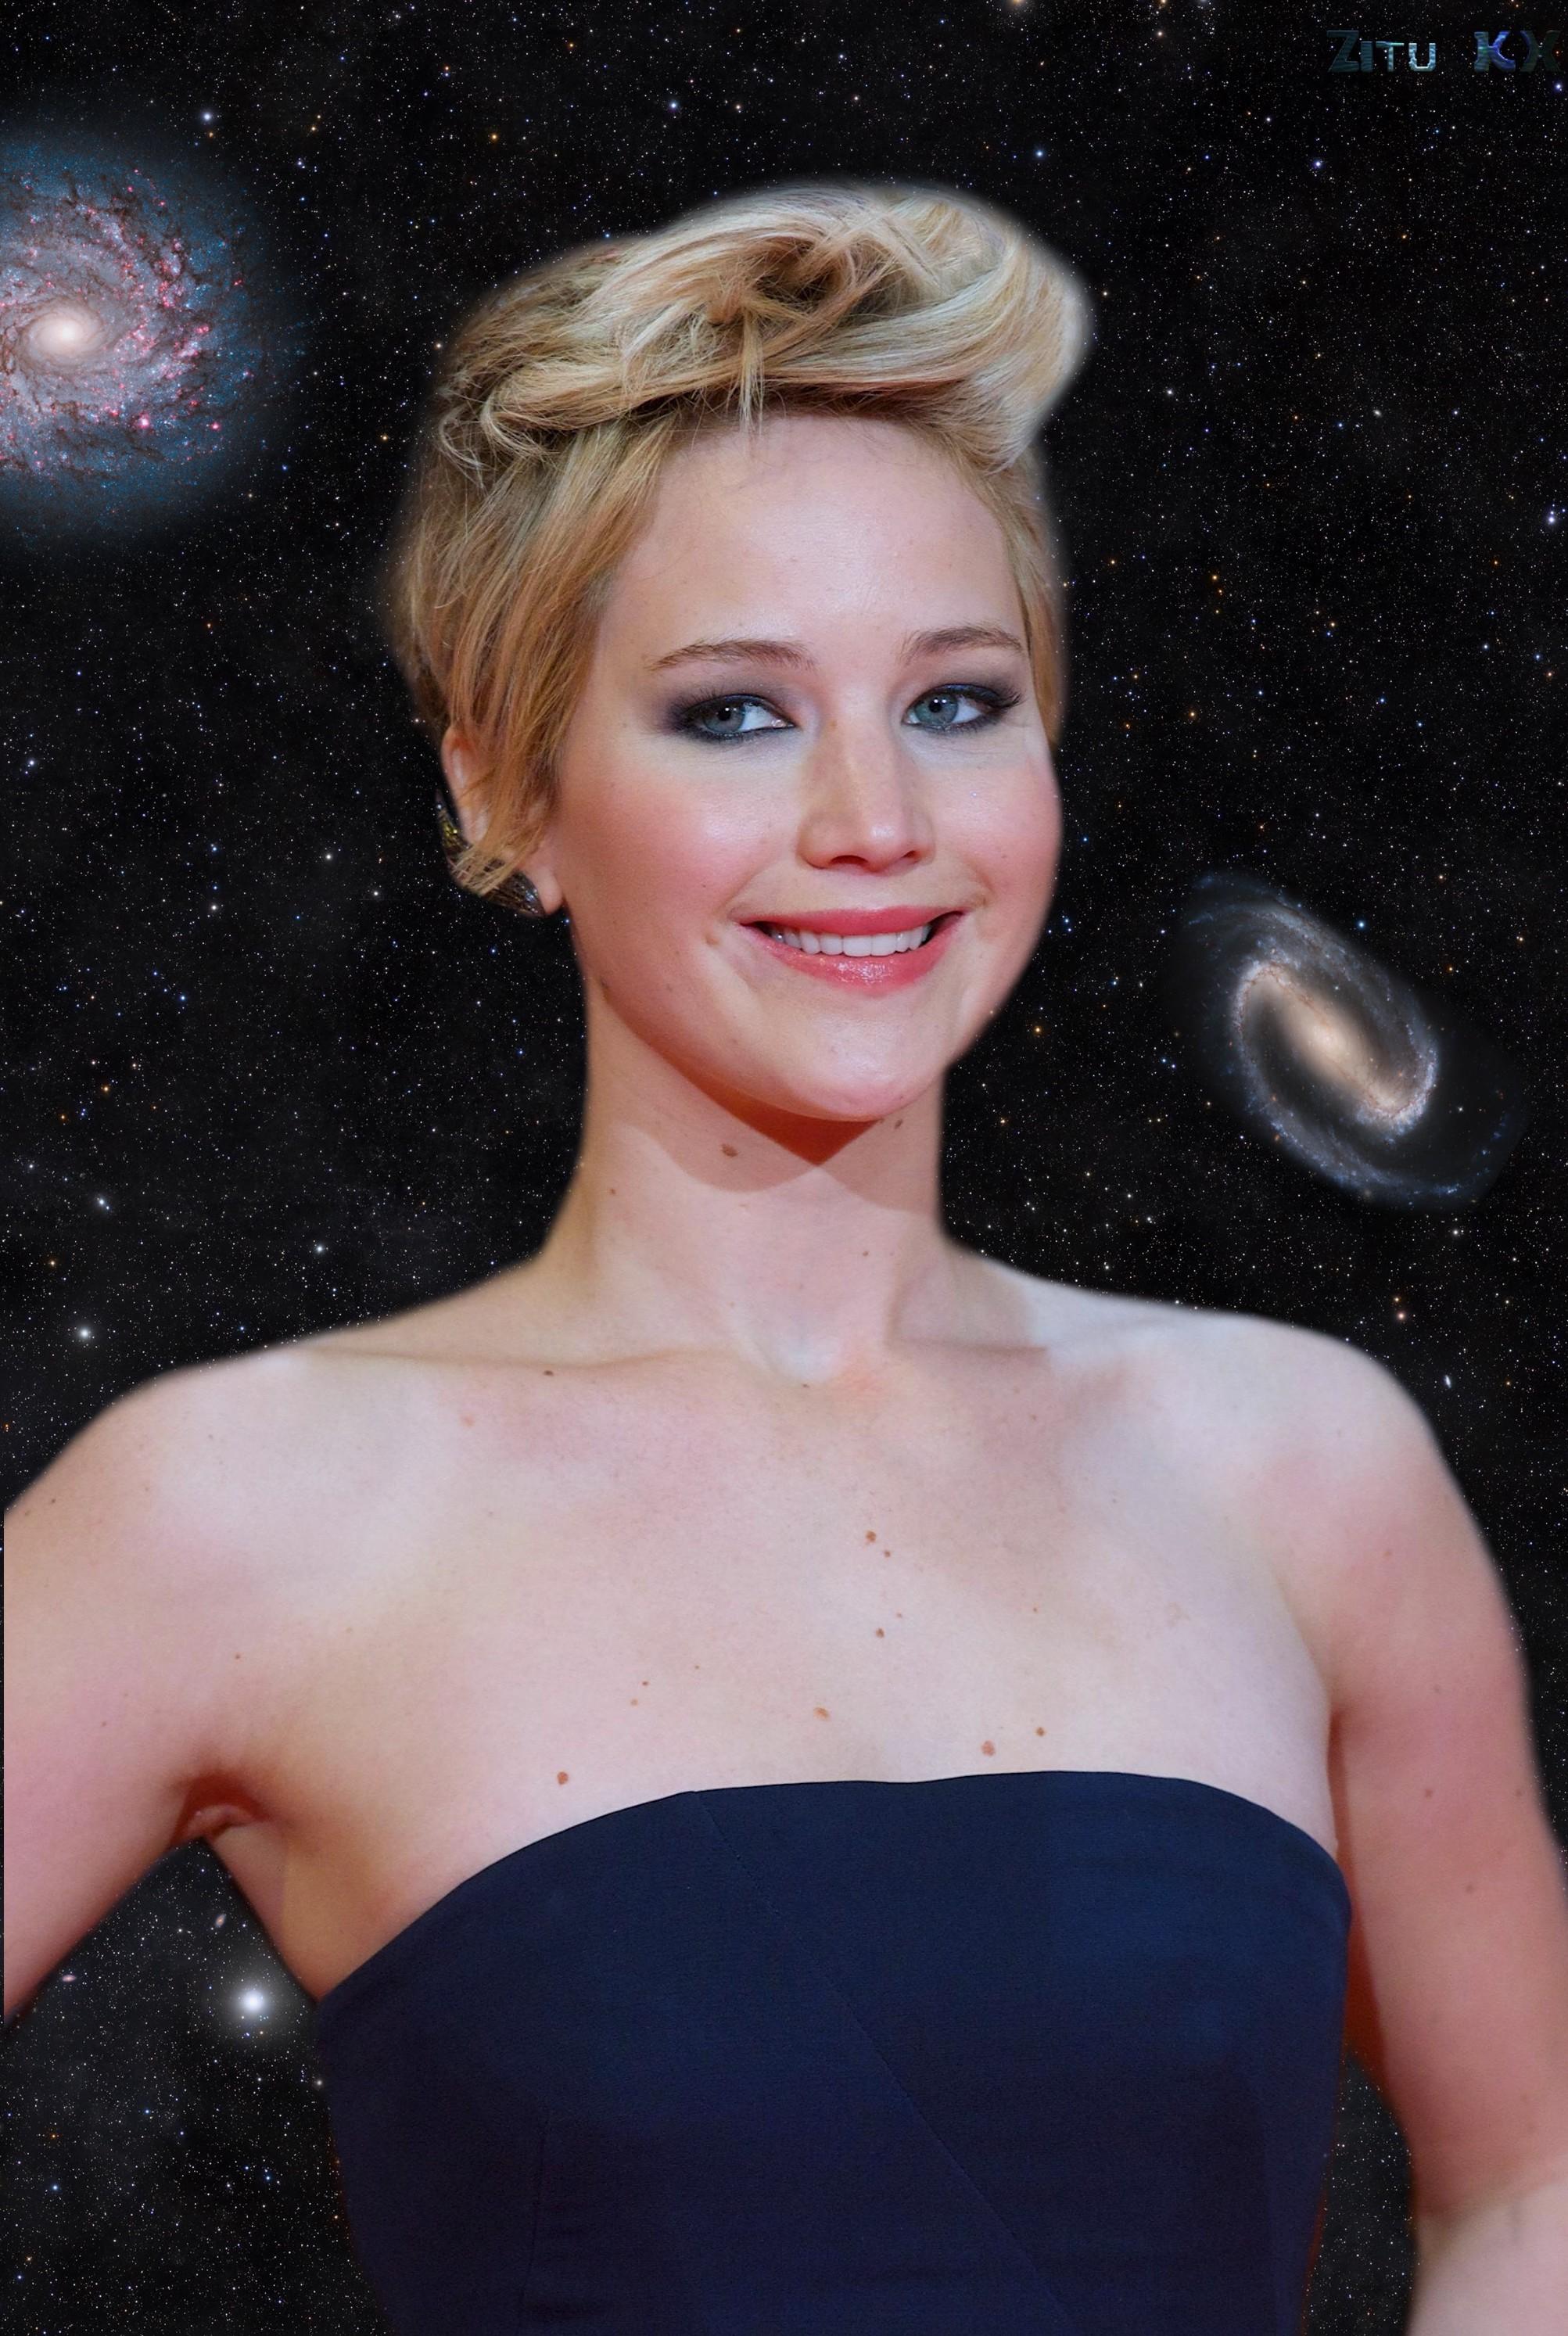 Growing Jennifer Lawrence (9 of 12) by ZituKX